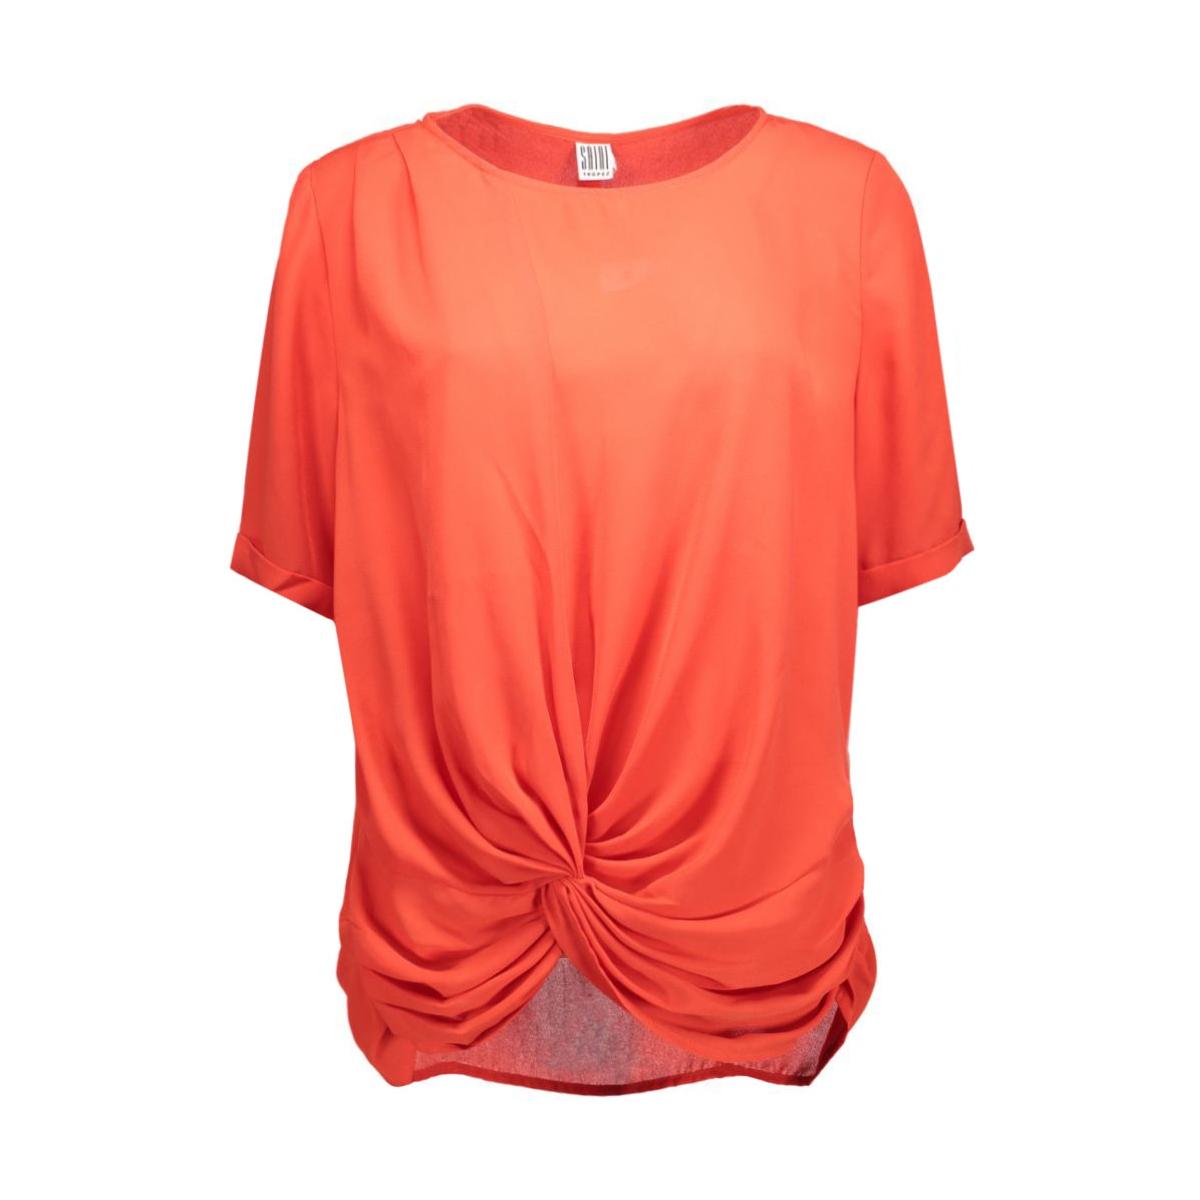 n1314 saint tropez t-shirt 7294